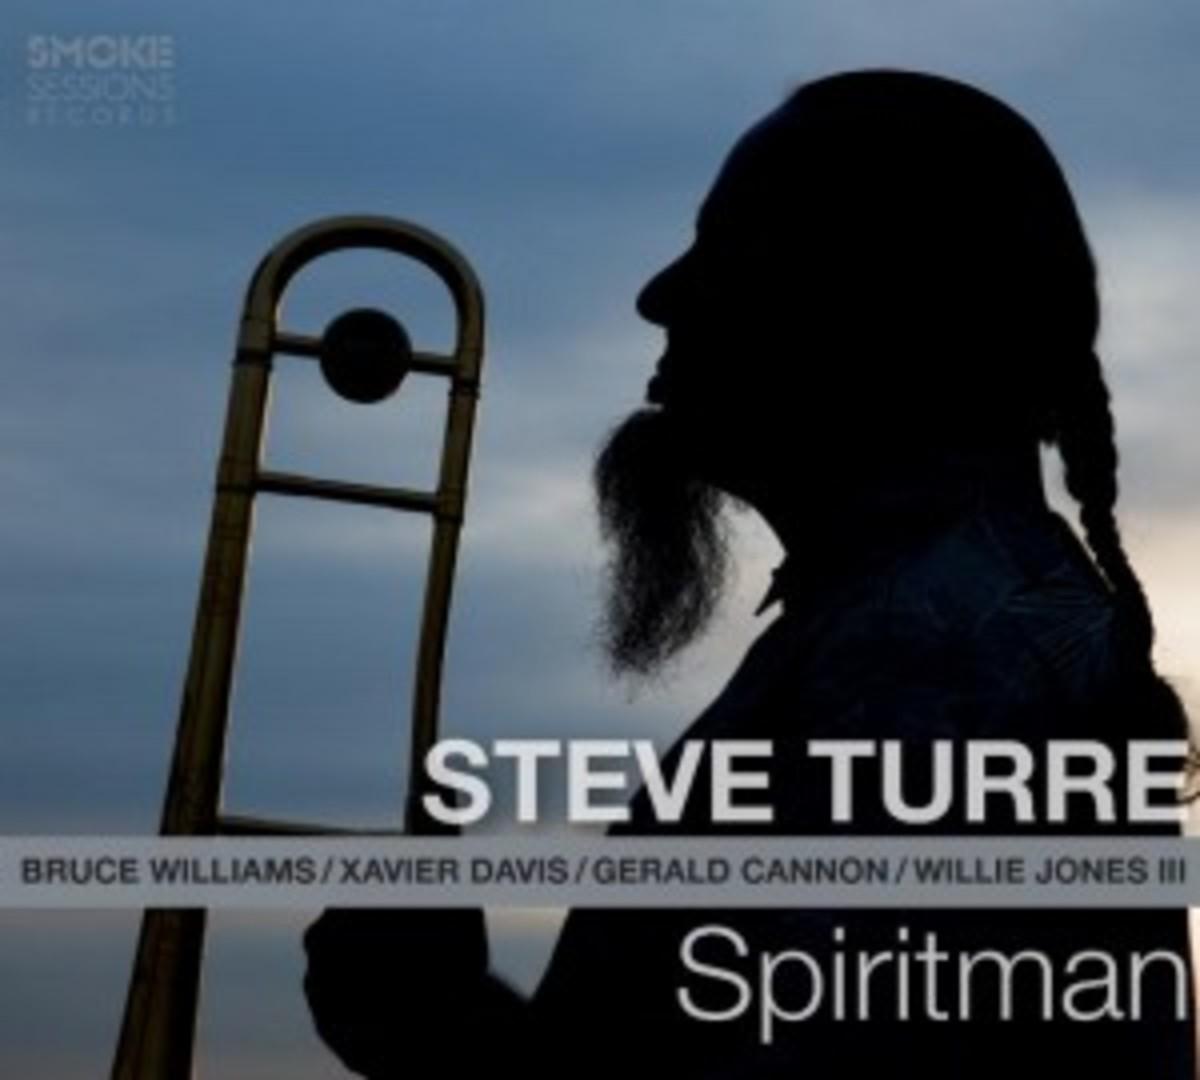 Steve Turre